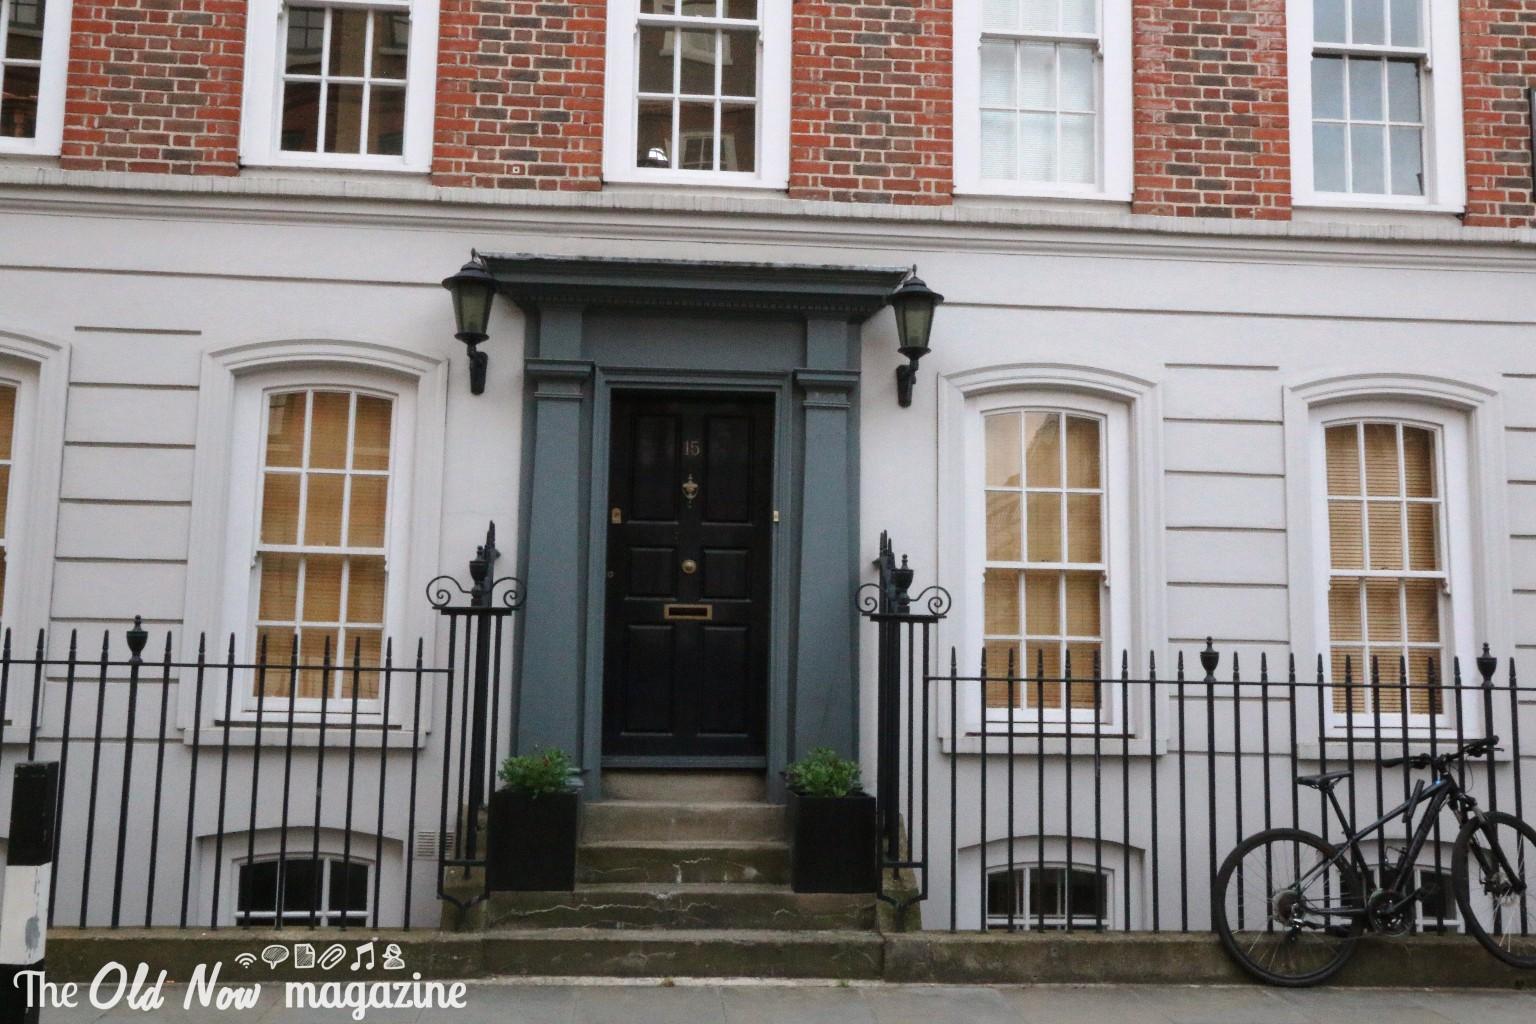 LONDRA THEOLDNOW (78)